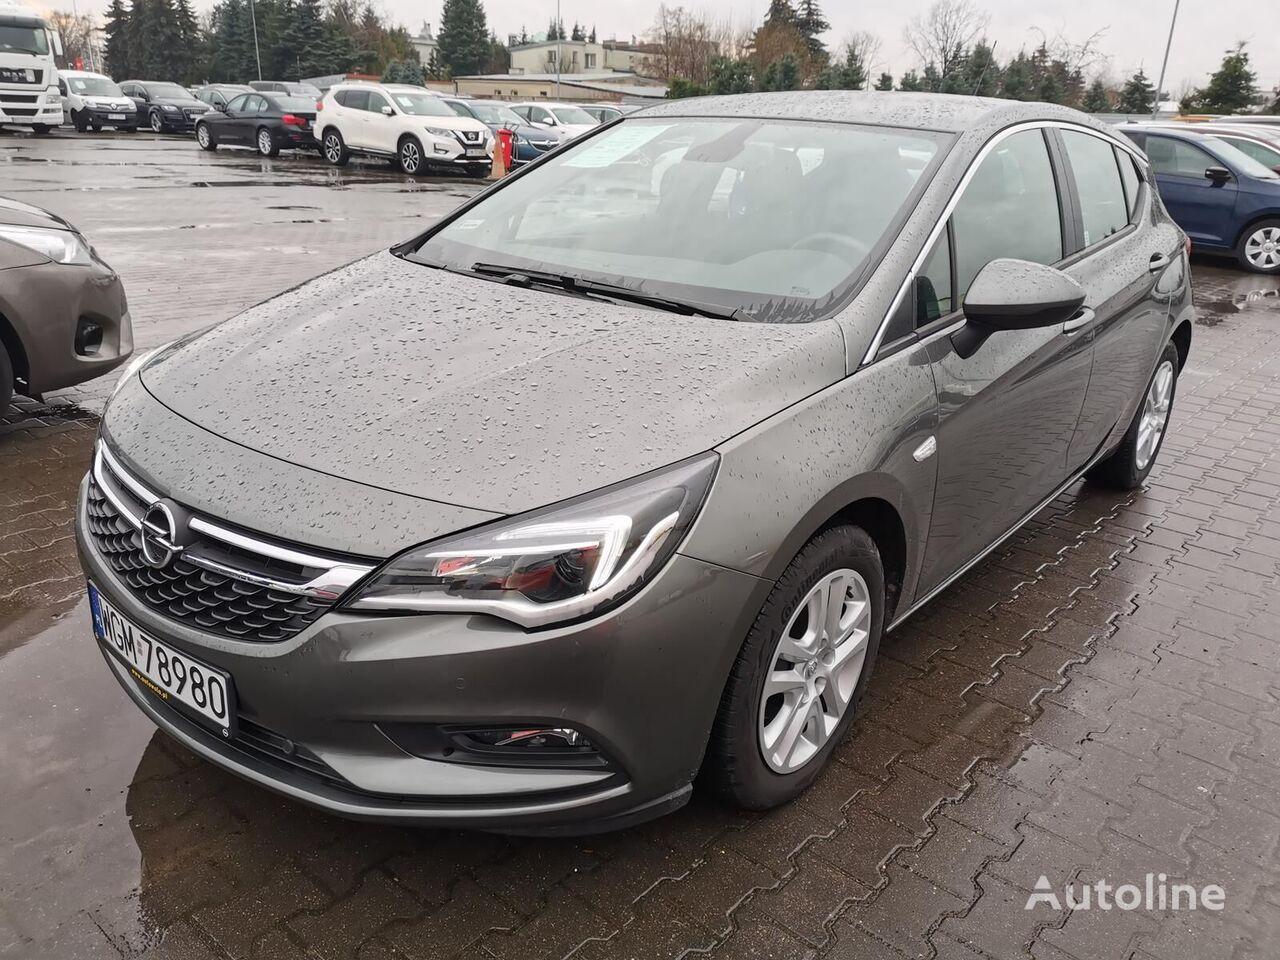 Opel Astra V 5dr Enjoy 1 4 T 110kw 150km Start Stop Hatchback For Sale Poland Warszawa Xa24544